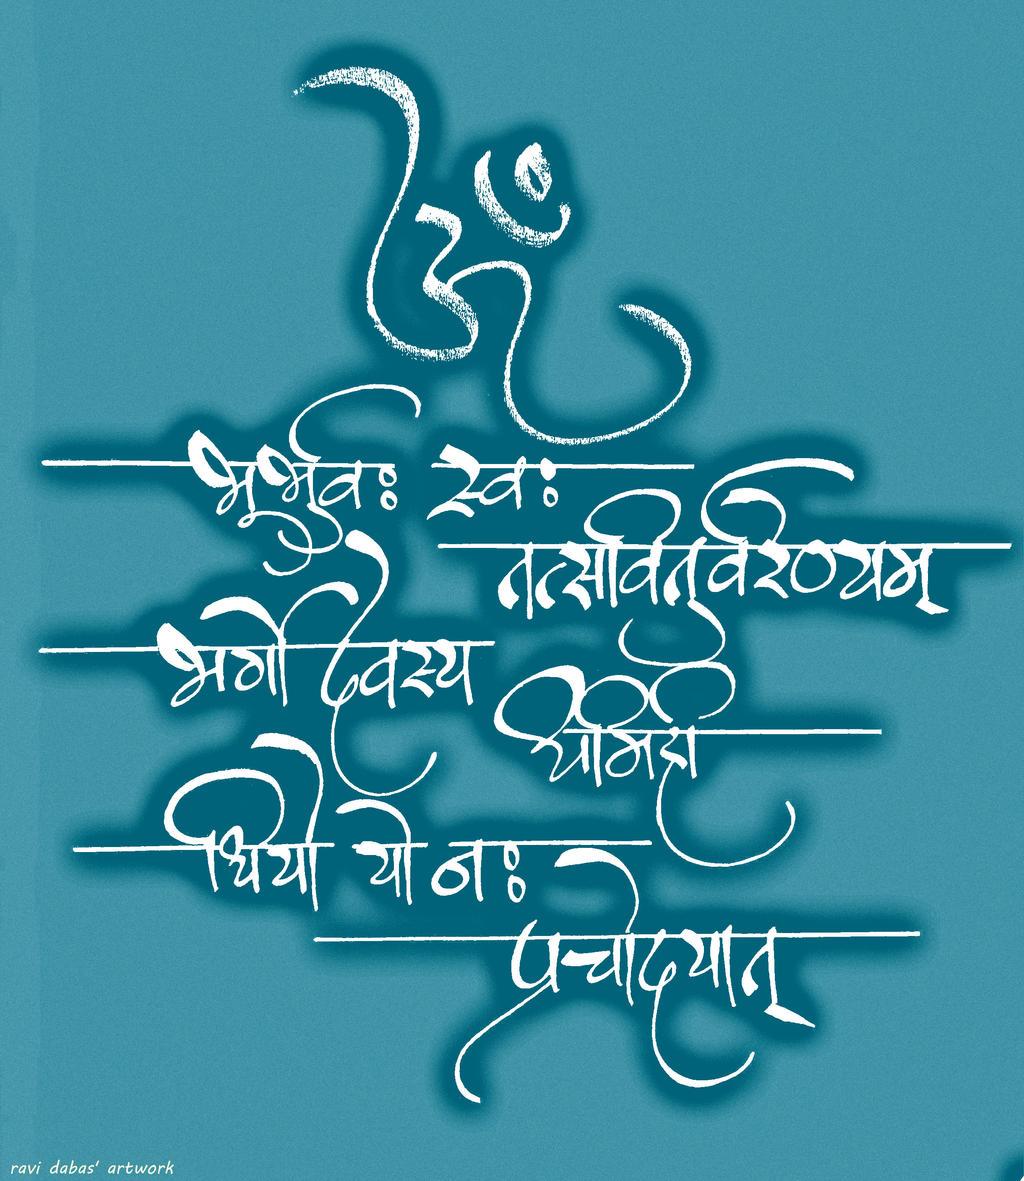 gayatri mantra hindi calligraphy by rdx558 on deviantart. Black Bedroom Furniture Sets. Home Design Ideas